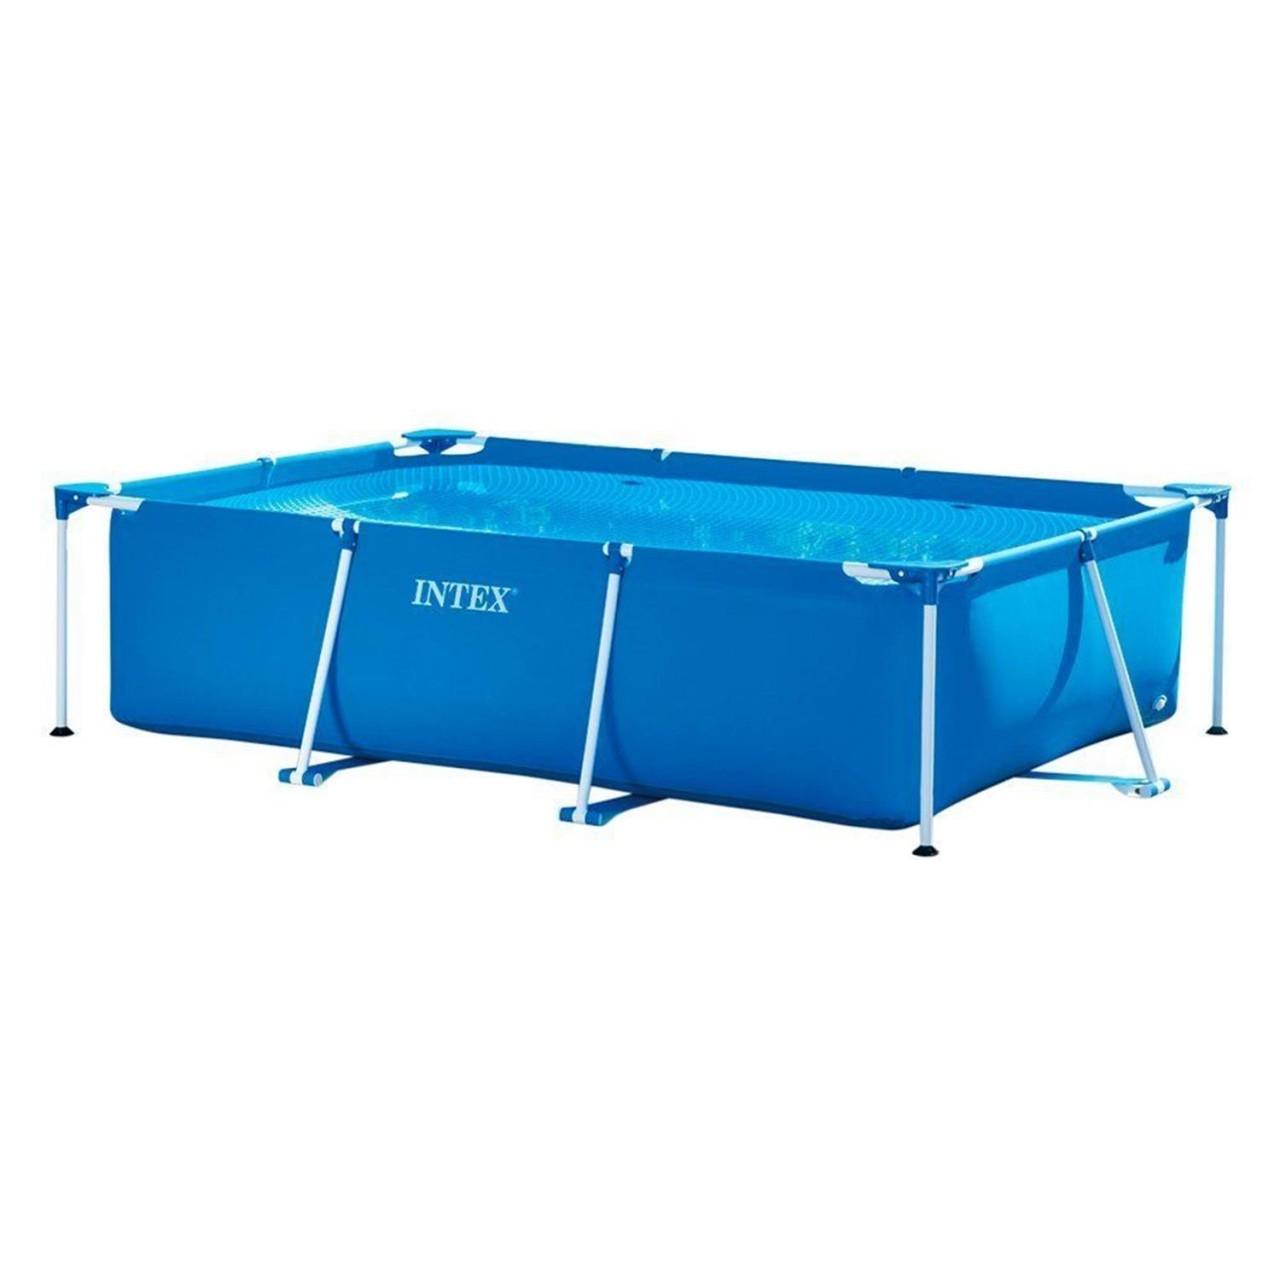 Intex Automatischer Poolreiniger für Pool  Swimmingpool Familienpool 28001